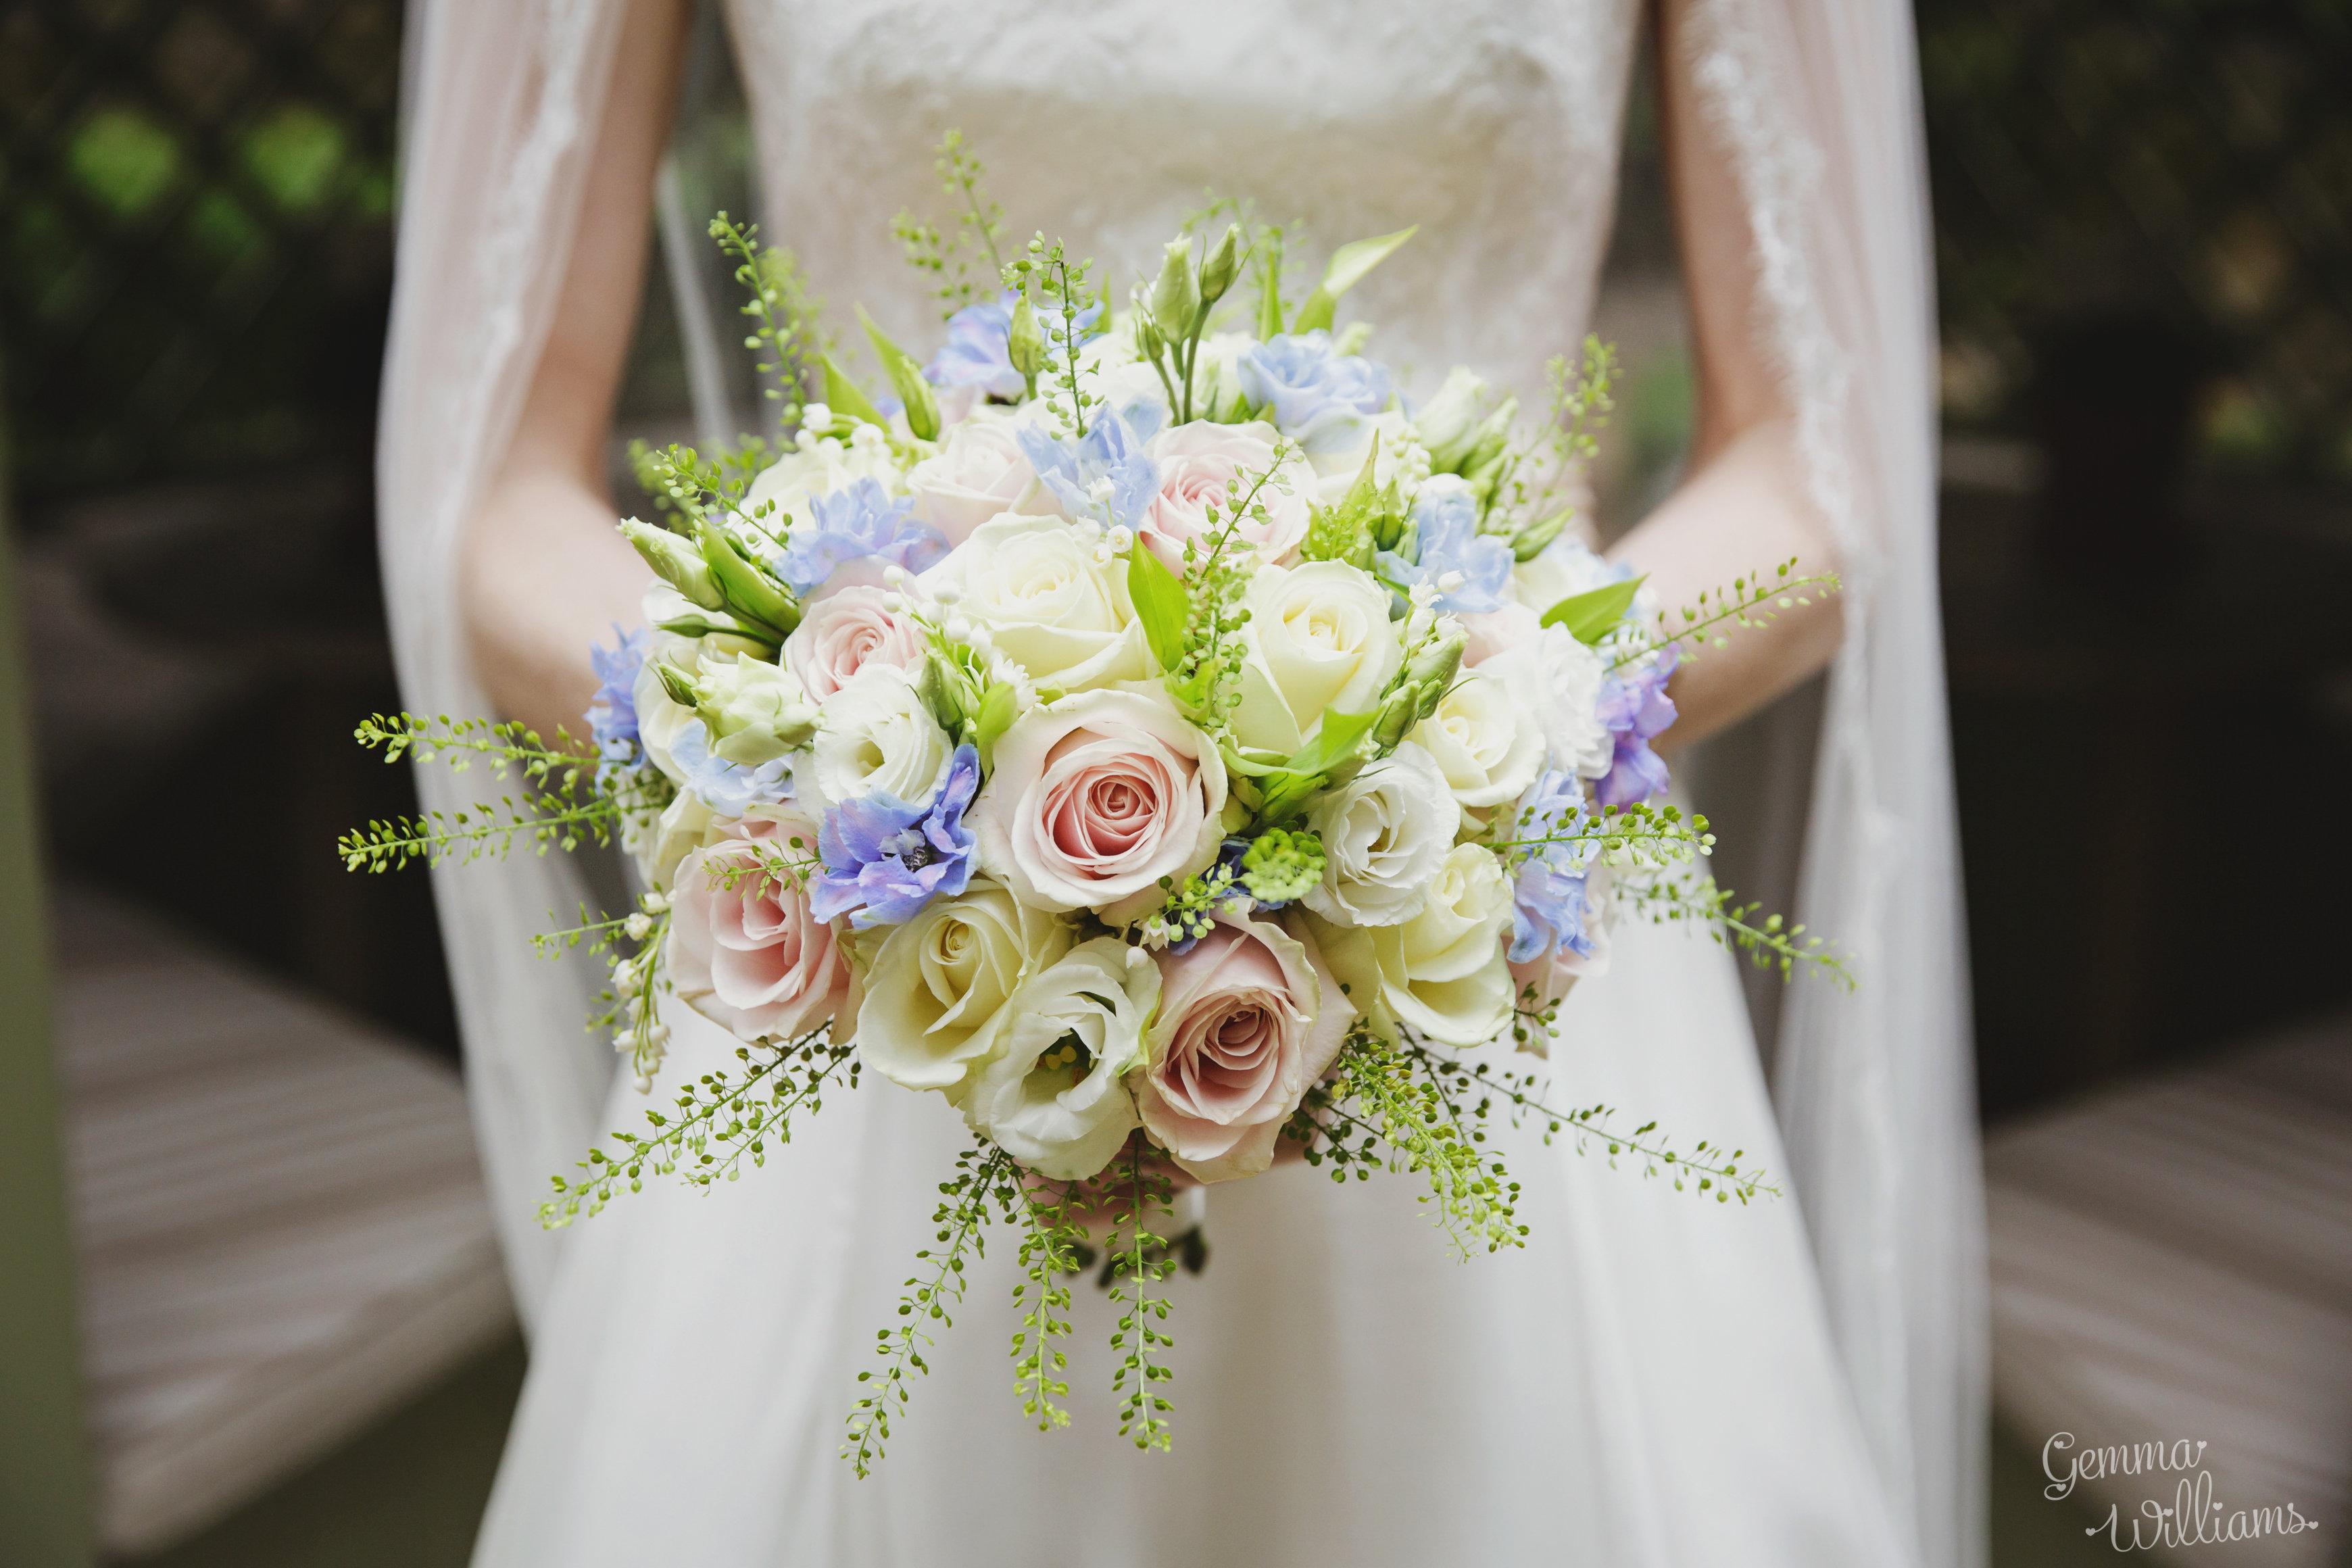 Gorgeous Elegant Oxford College Wedding Flower bouquet at Rhodes House Oxford Joanna Carter Wedding Flower Oxford Oxfordshire Buckinghamshire Berkshire London